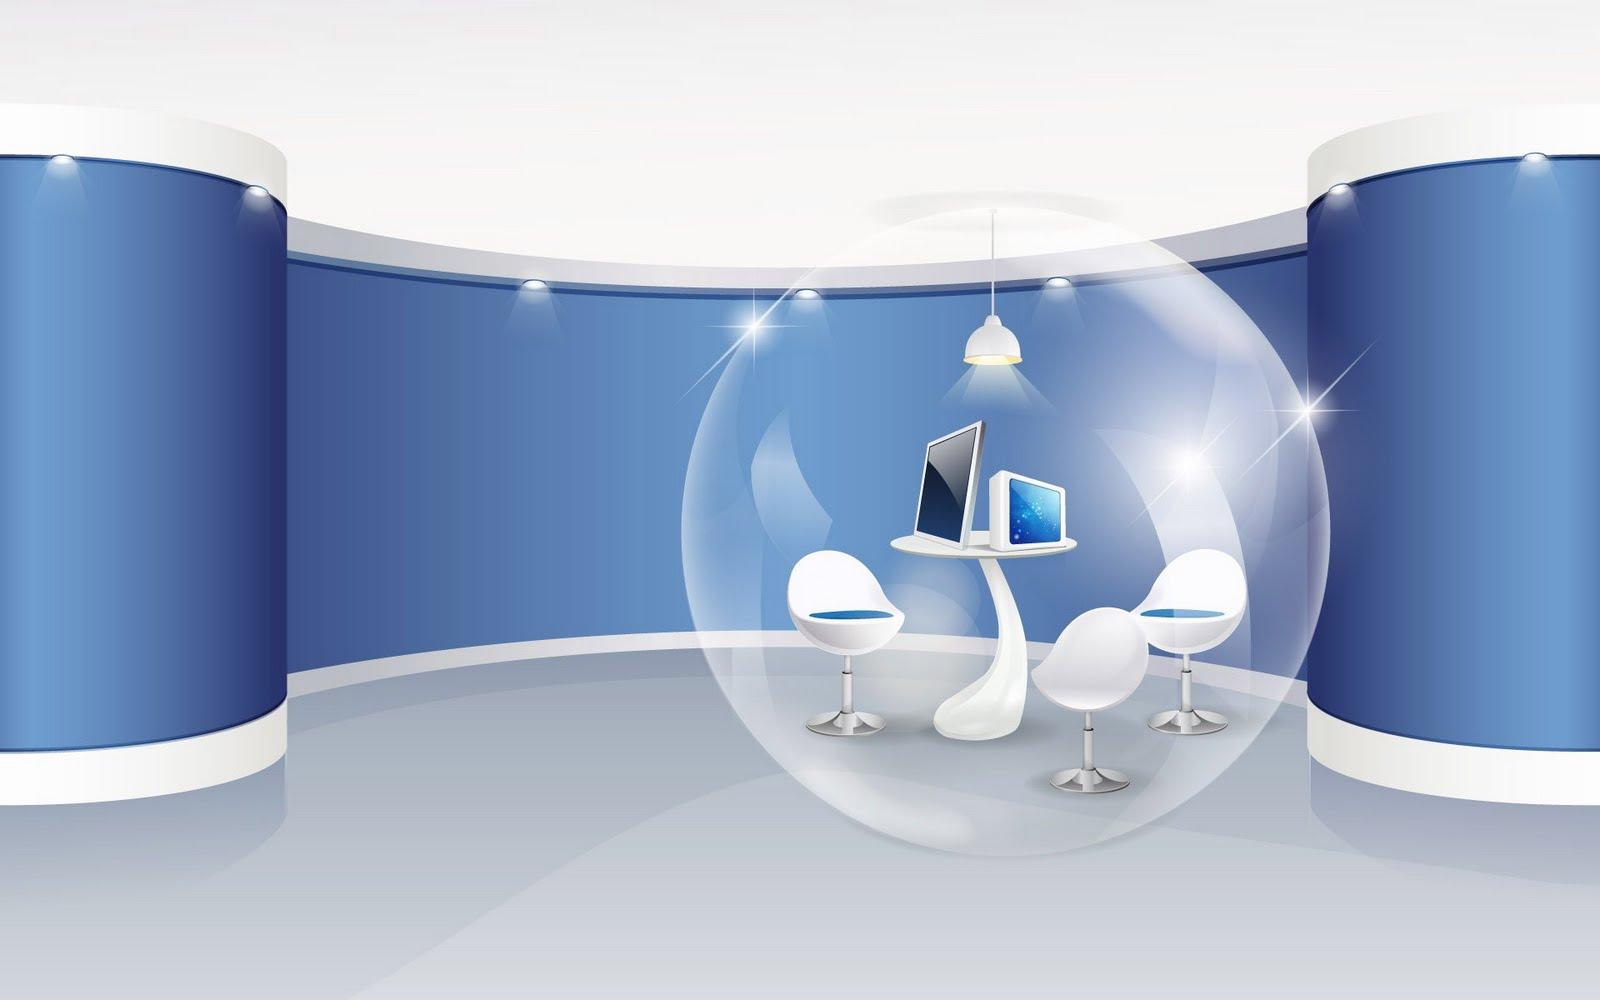 Digital Art Interior Design HD Wallpaper Set 1